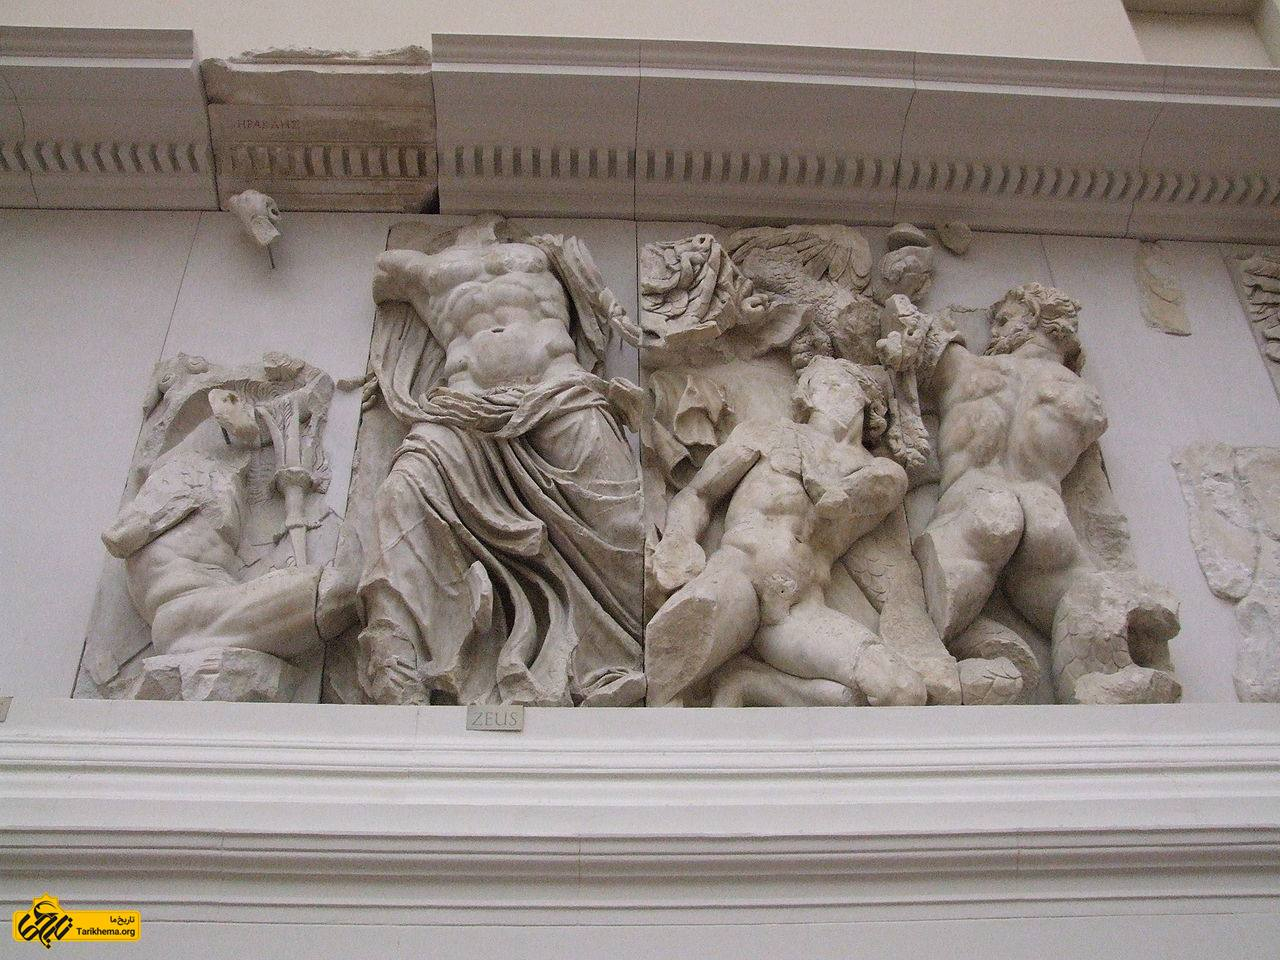 عکس زئوس (مرکز سمت چپ) در مقابل پورفیریون (به راست) about-zeus Tarikhema.org